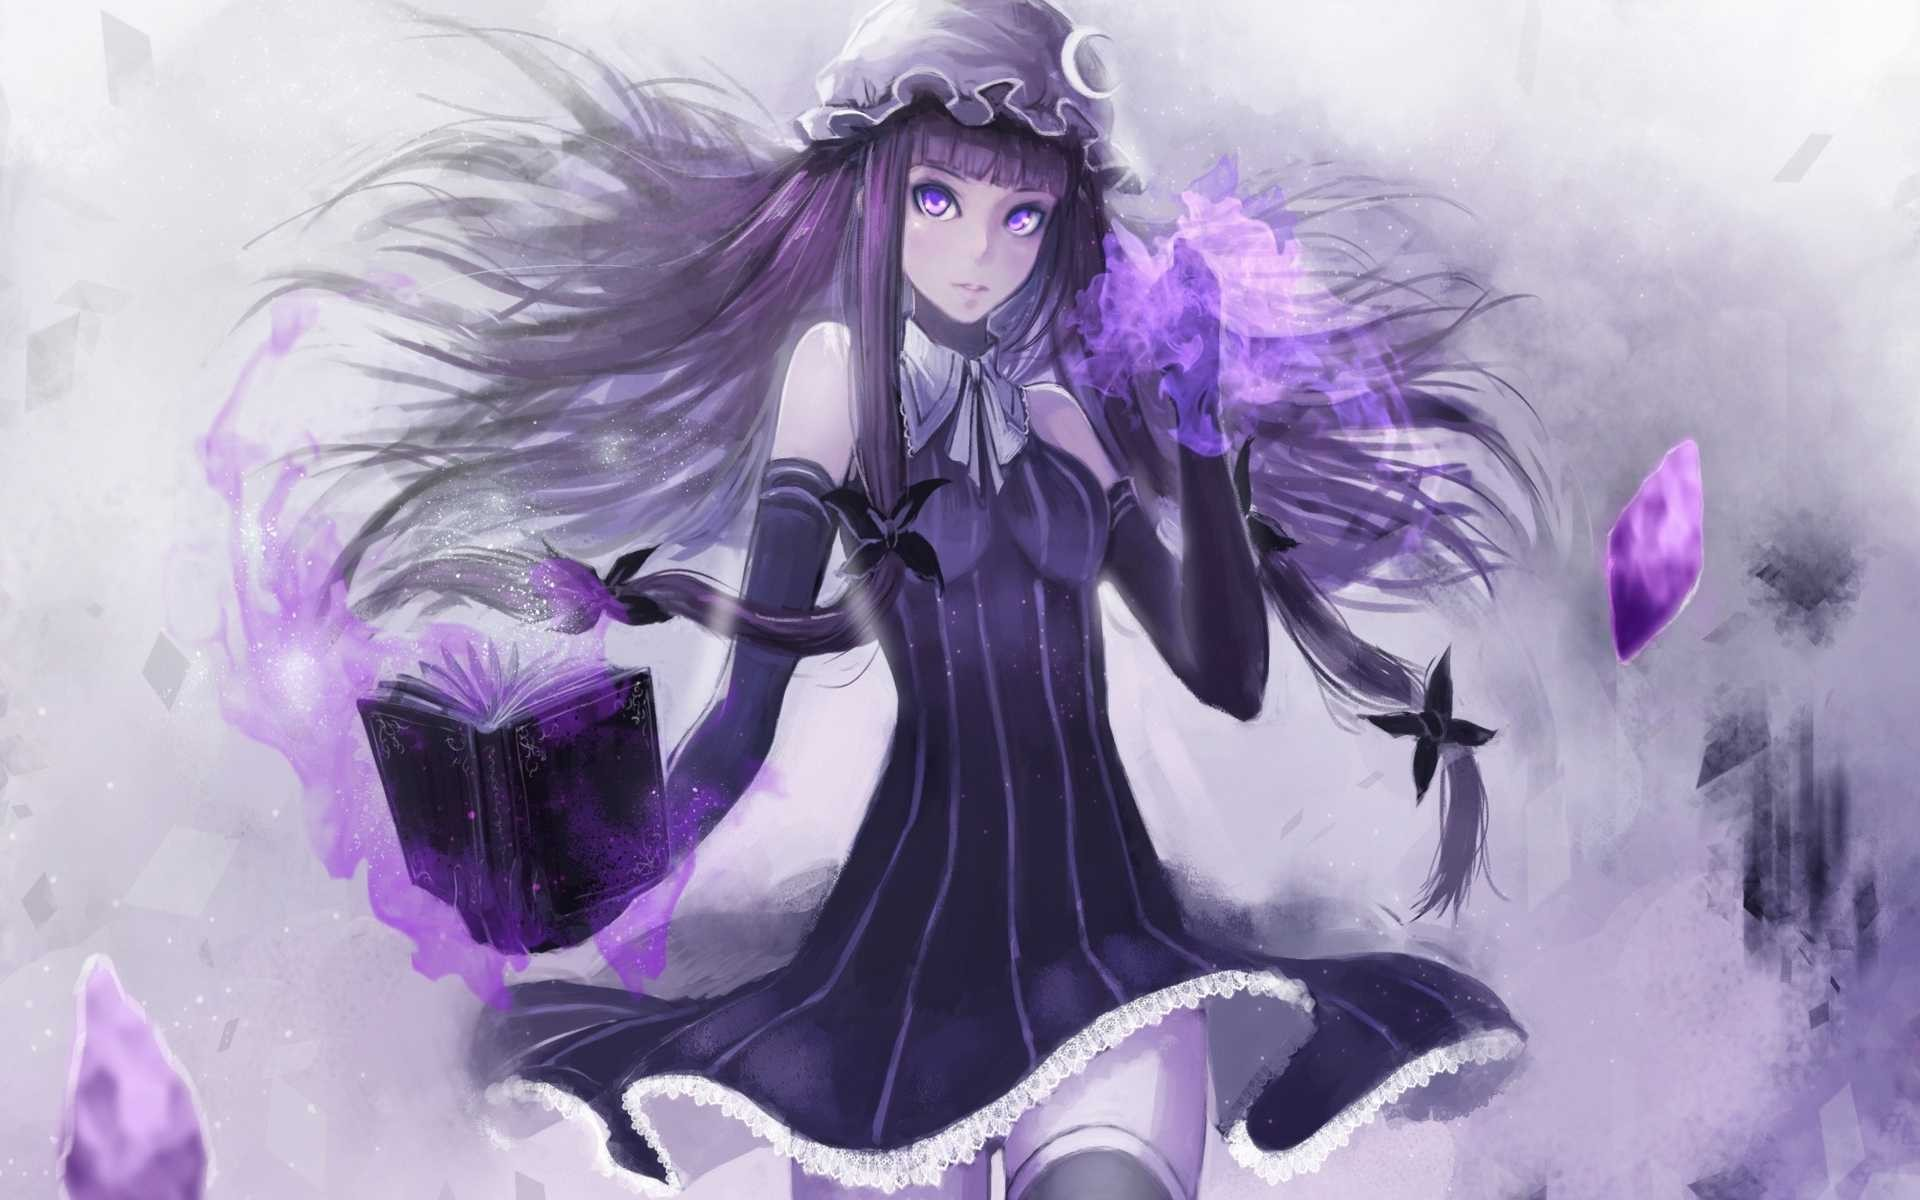 Anime 1920x1200 manga Patchouli Knowledge anime girls purple eyes books long hair anime